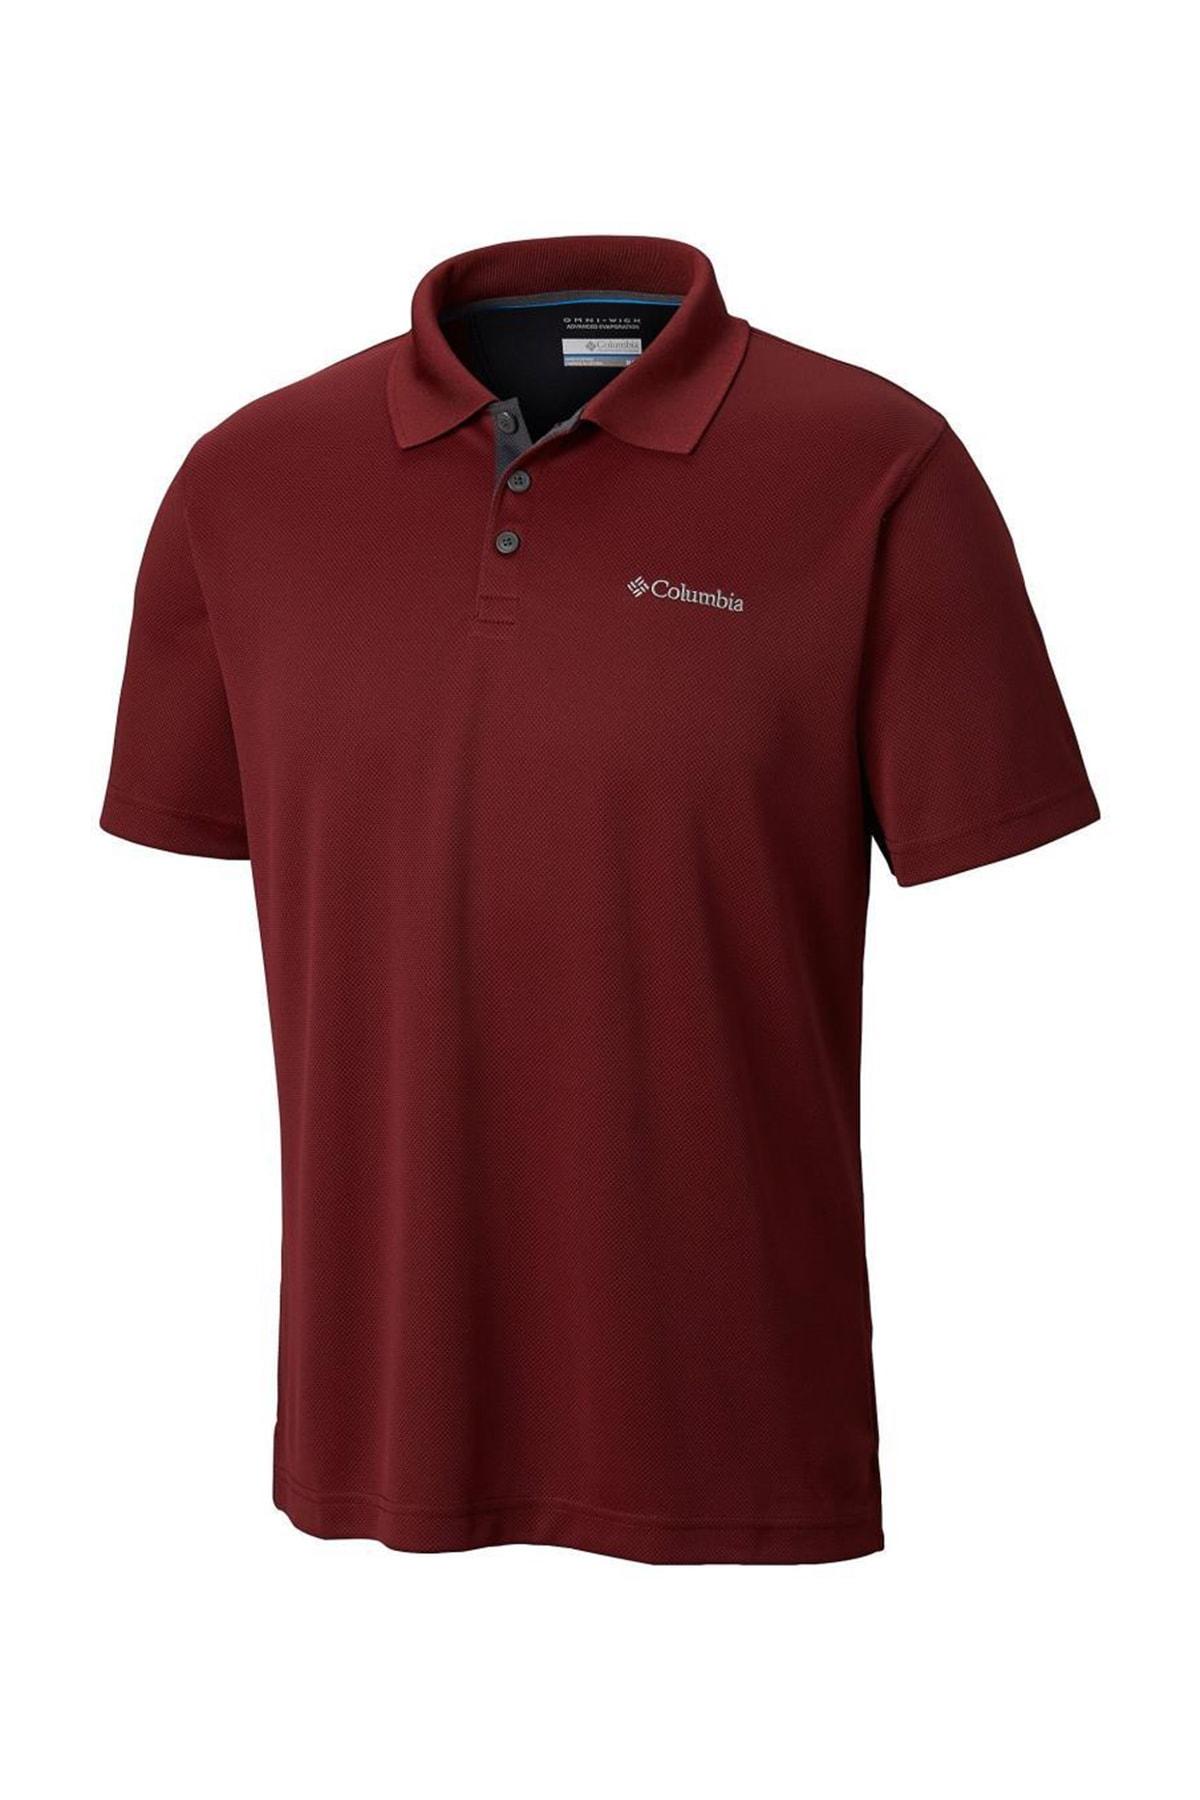 Columbia Utilizer Erkek Polo T-shirt Ao0126-664